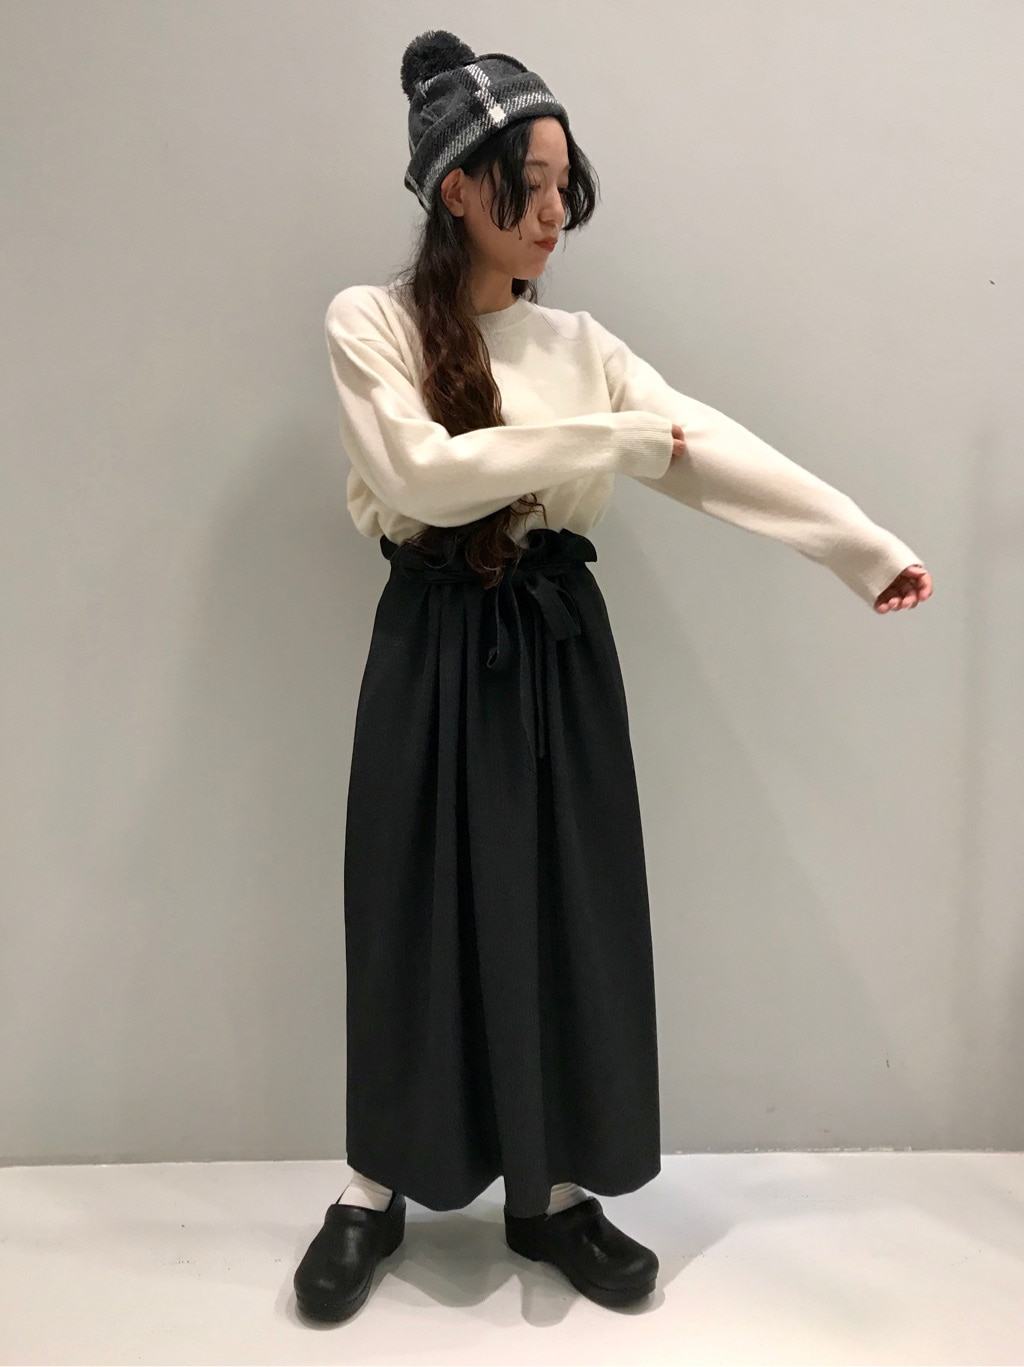 bulle de savon なんばシティ 身長:148cm 2020.10.15